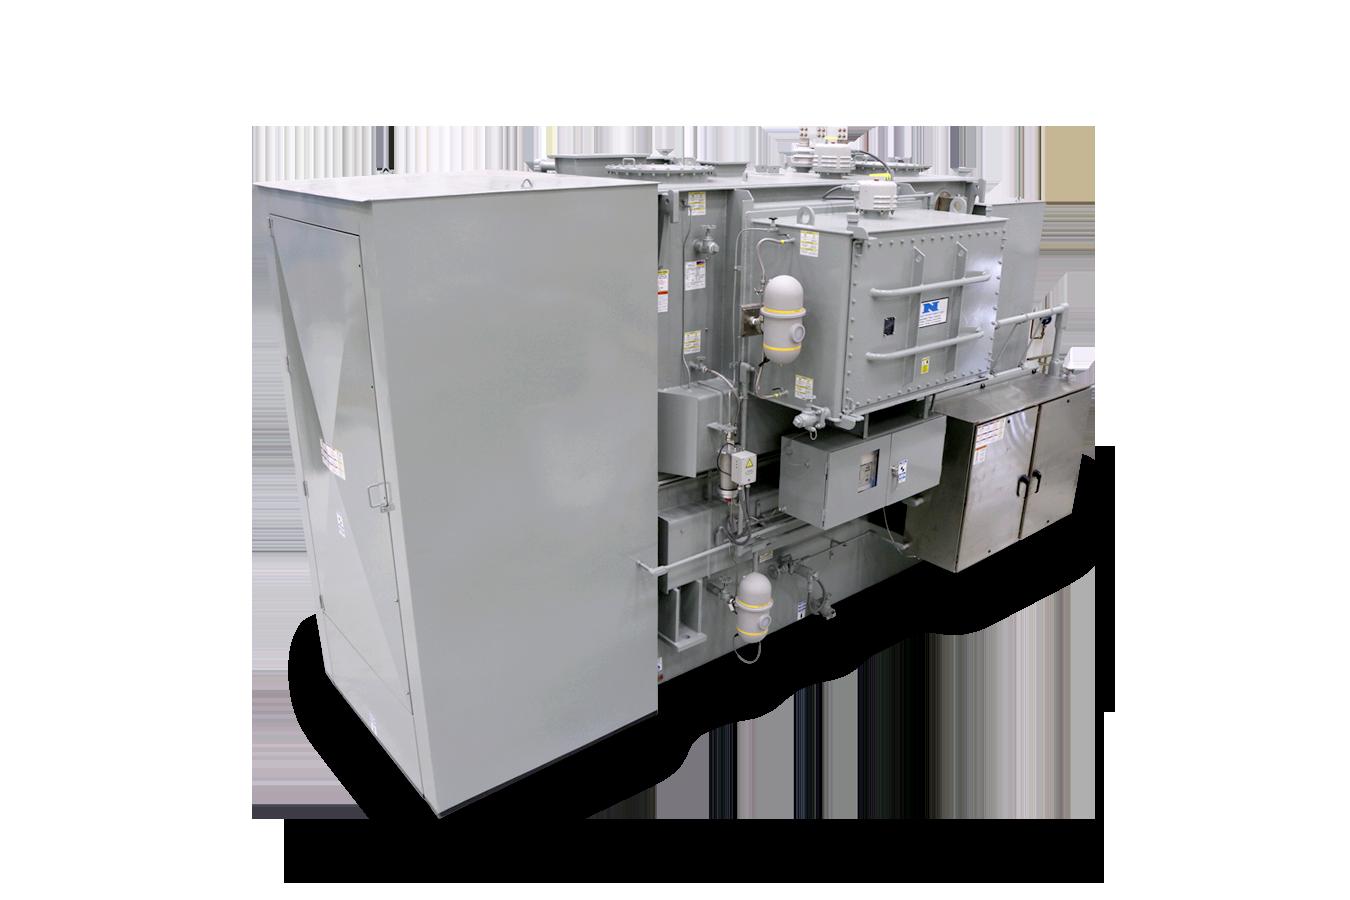 Phase Shifting Transformer - Niagara Power Transformer